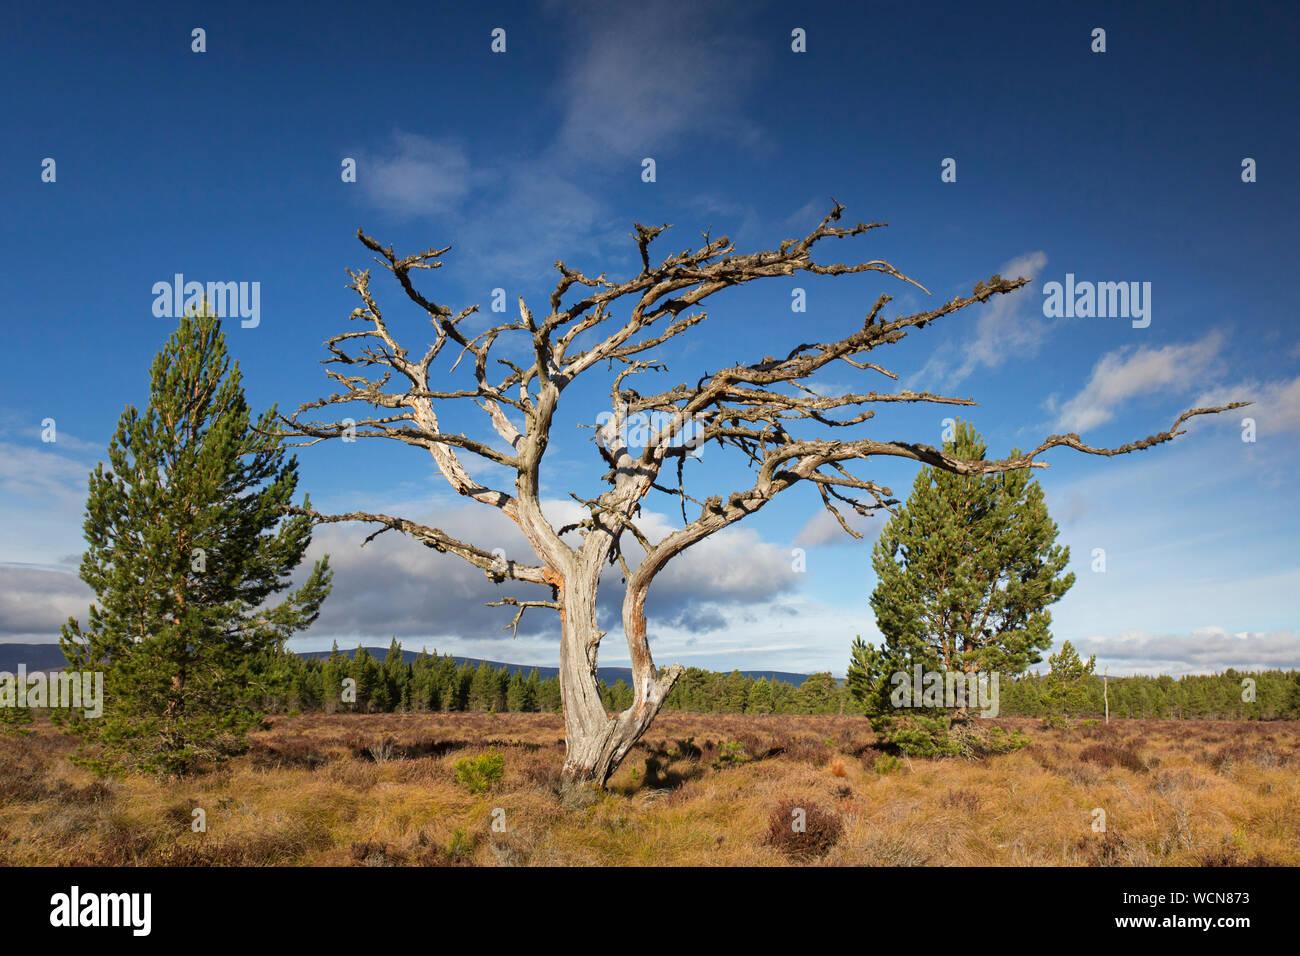 Dead Scots pine tree (Pinus sylvestris) in moorland / heath, Cairngorms National Park, Badenoch and Strathspey, Scotland, UK Stock Photo